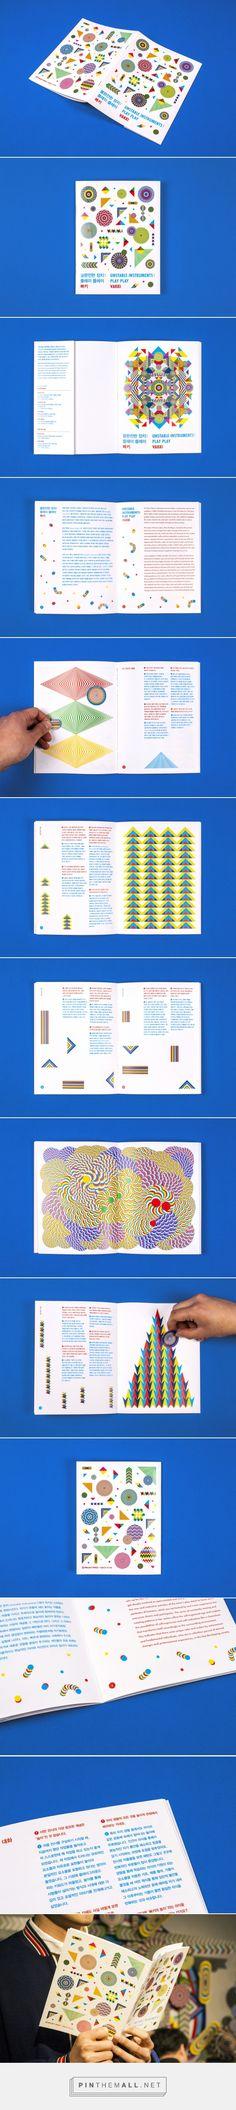 Poster, leaflet and ticket design for Daelim Museum D-PROJECT SPACE UNSTABLE INSTRUMENTS: PLAY PLAY VAKKI 대림미술관 구슬모아 당구장의 2015년 두번째 전시인 <불완전한 장치: 플레이 플레이 빠키>를 위한 포스터, 티켓, 그리고 리플렛을 디자인하였습니다.